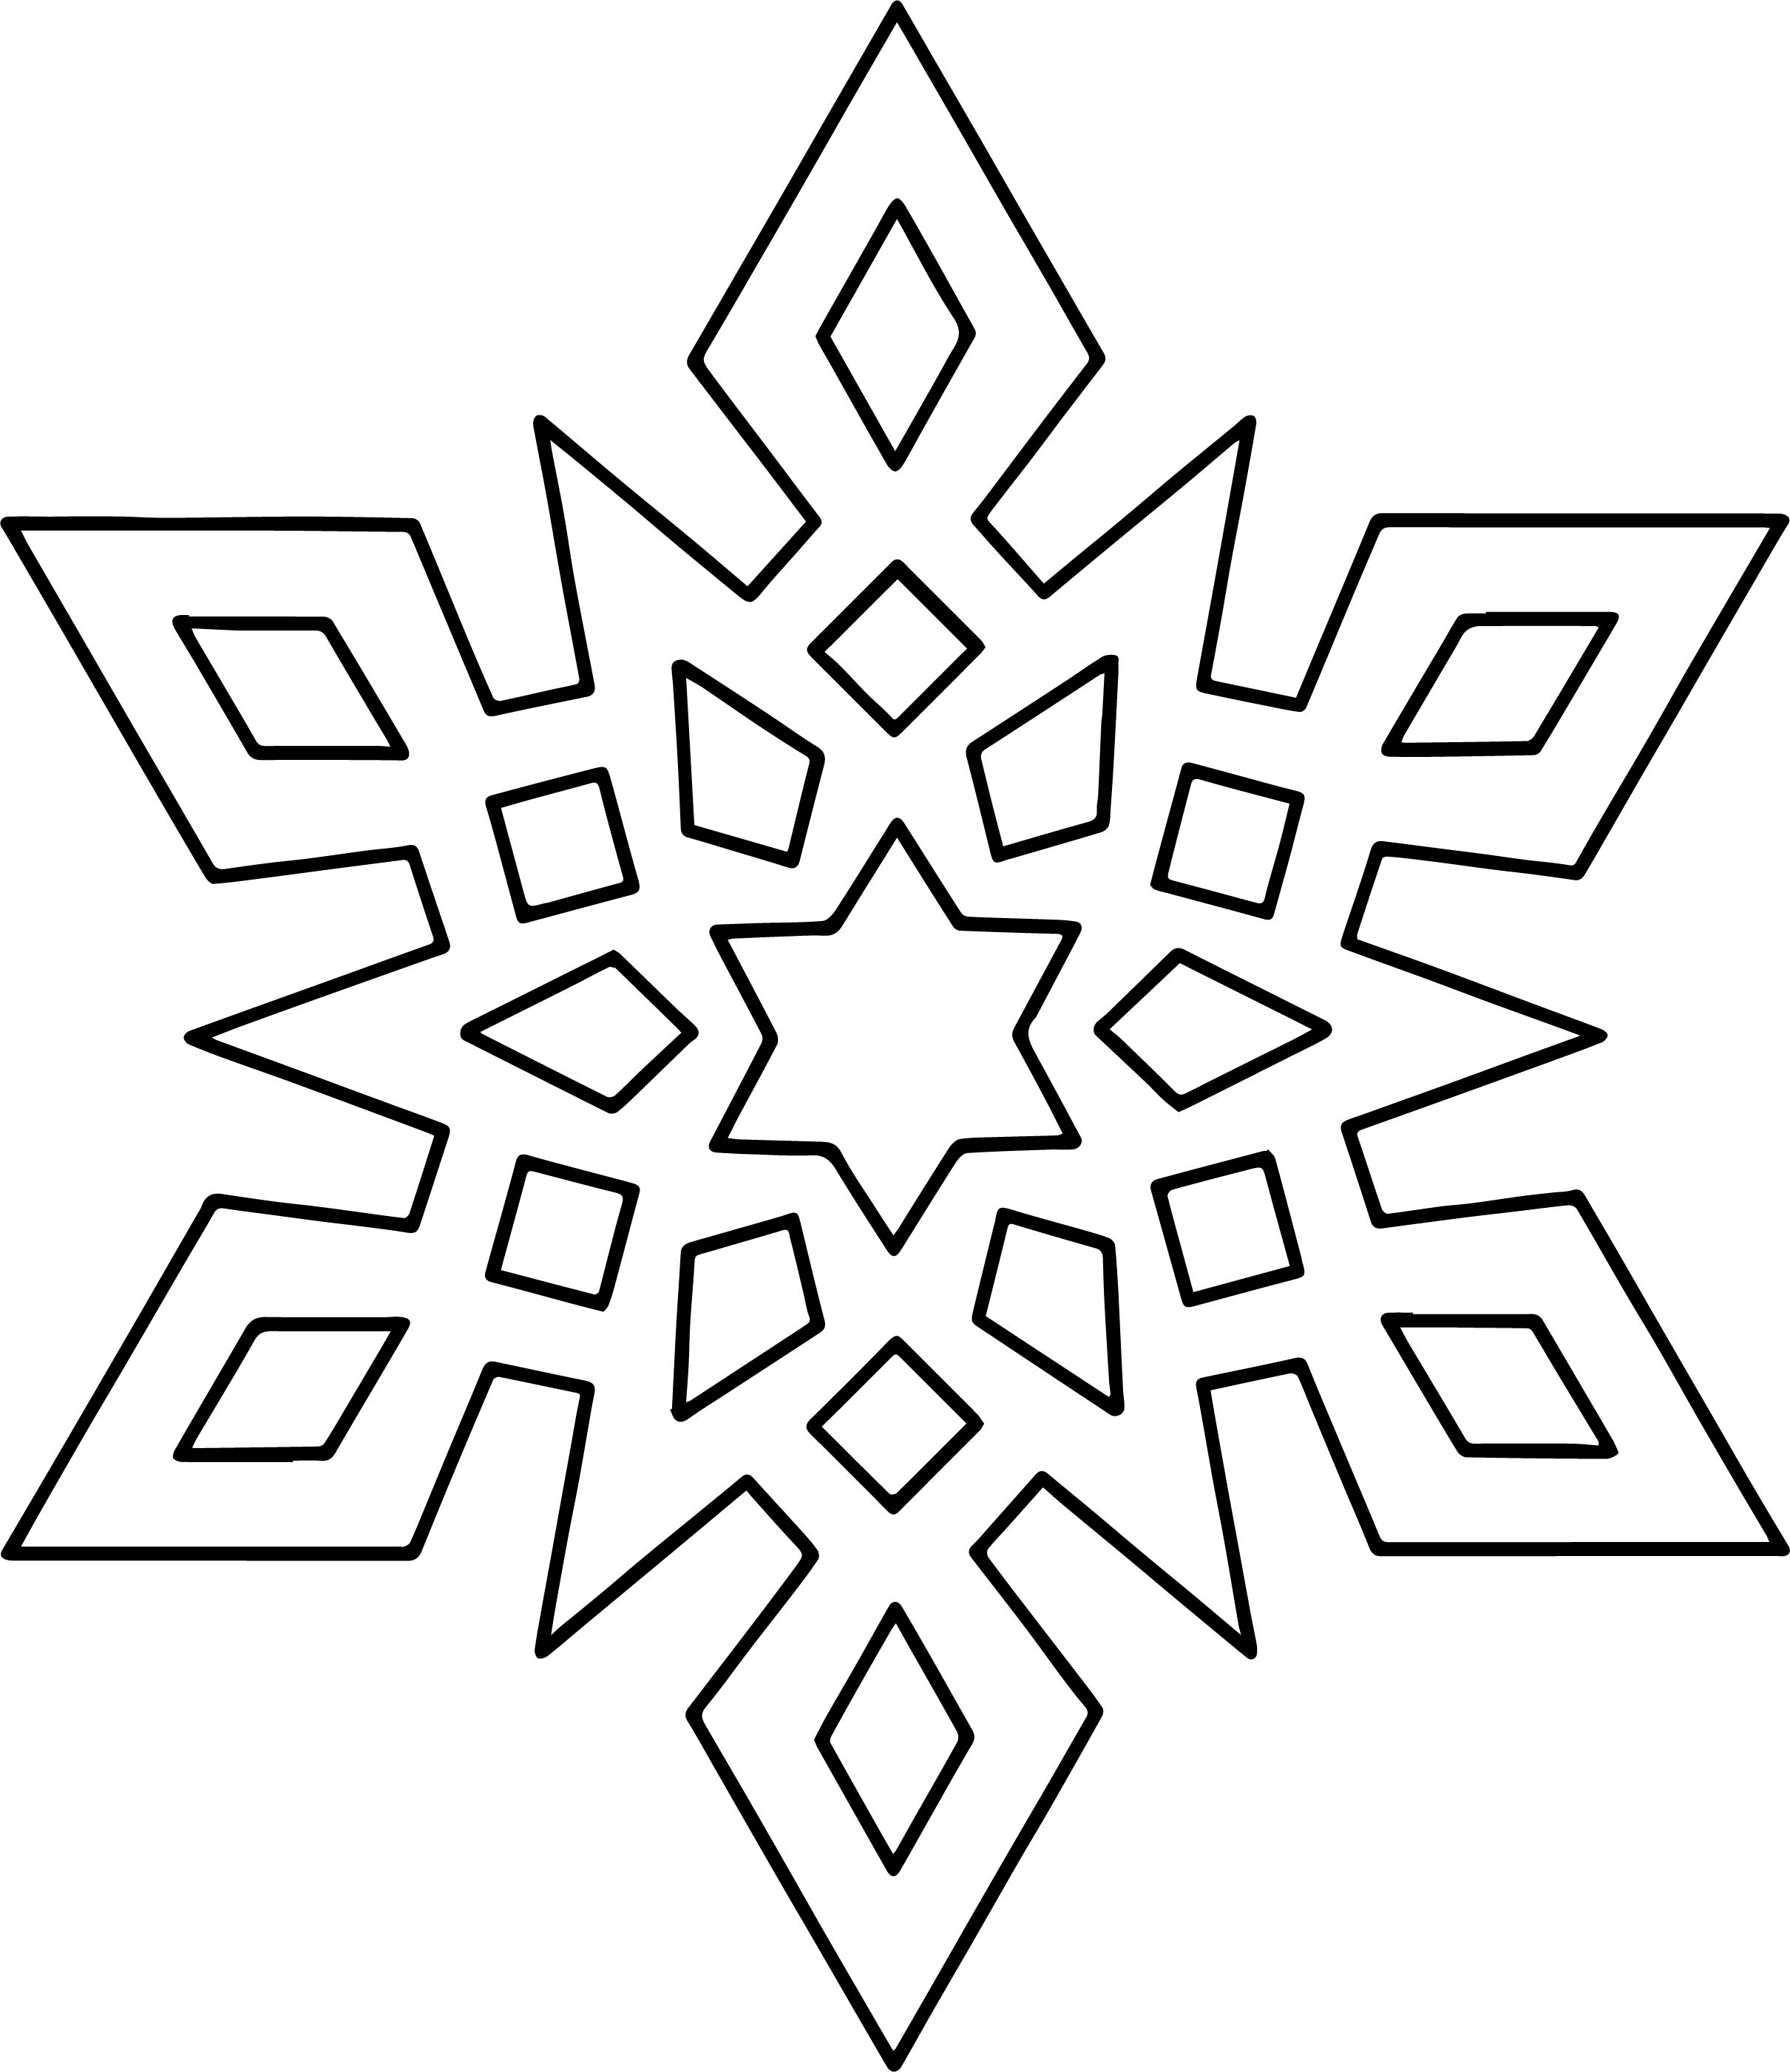 Crystal Snowflake Coloring Page | Wecoloringpage